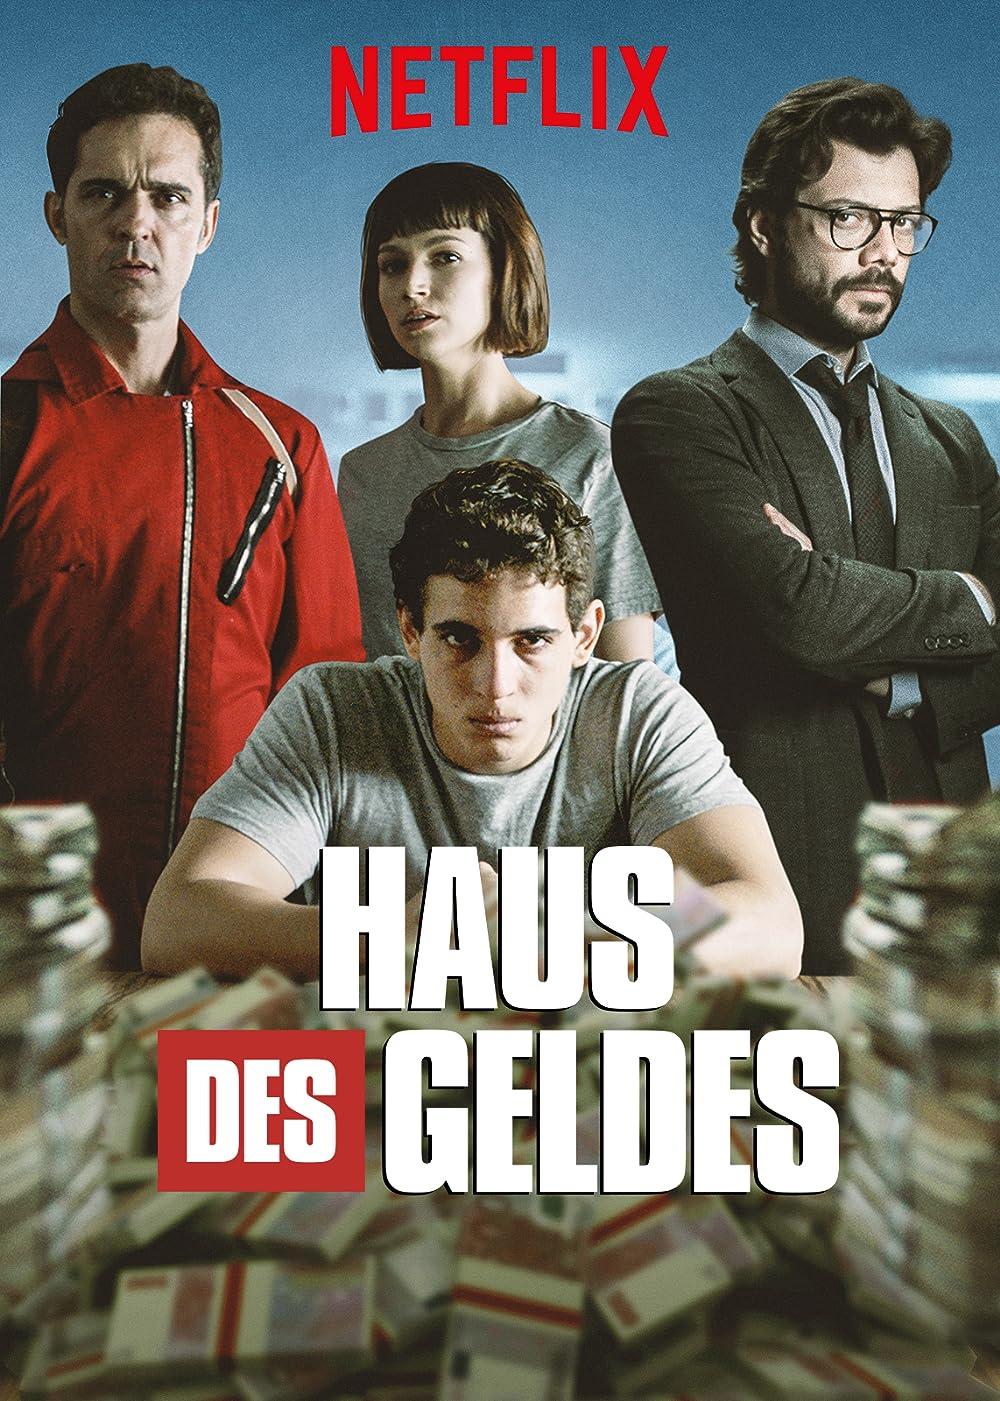 Money Heist S2 (2018) Subtitle Indonesia